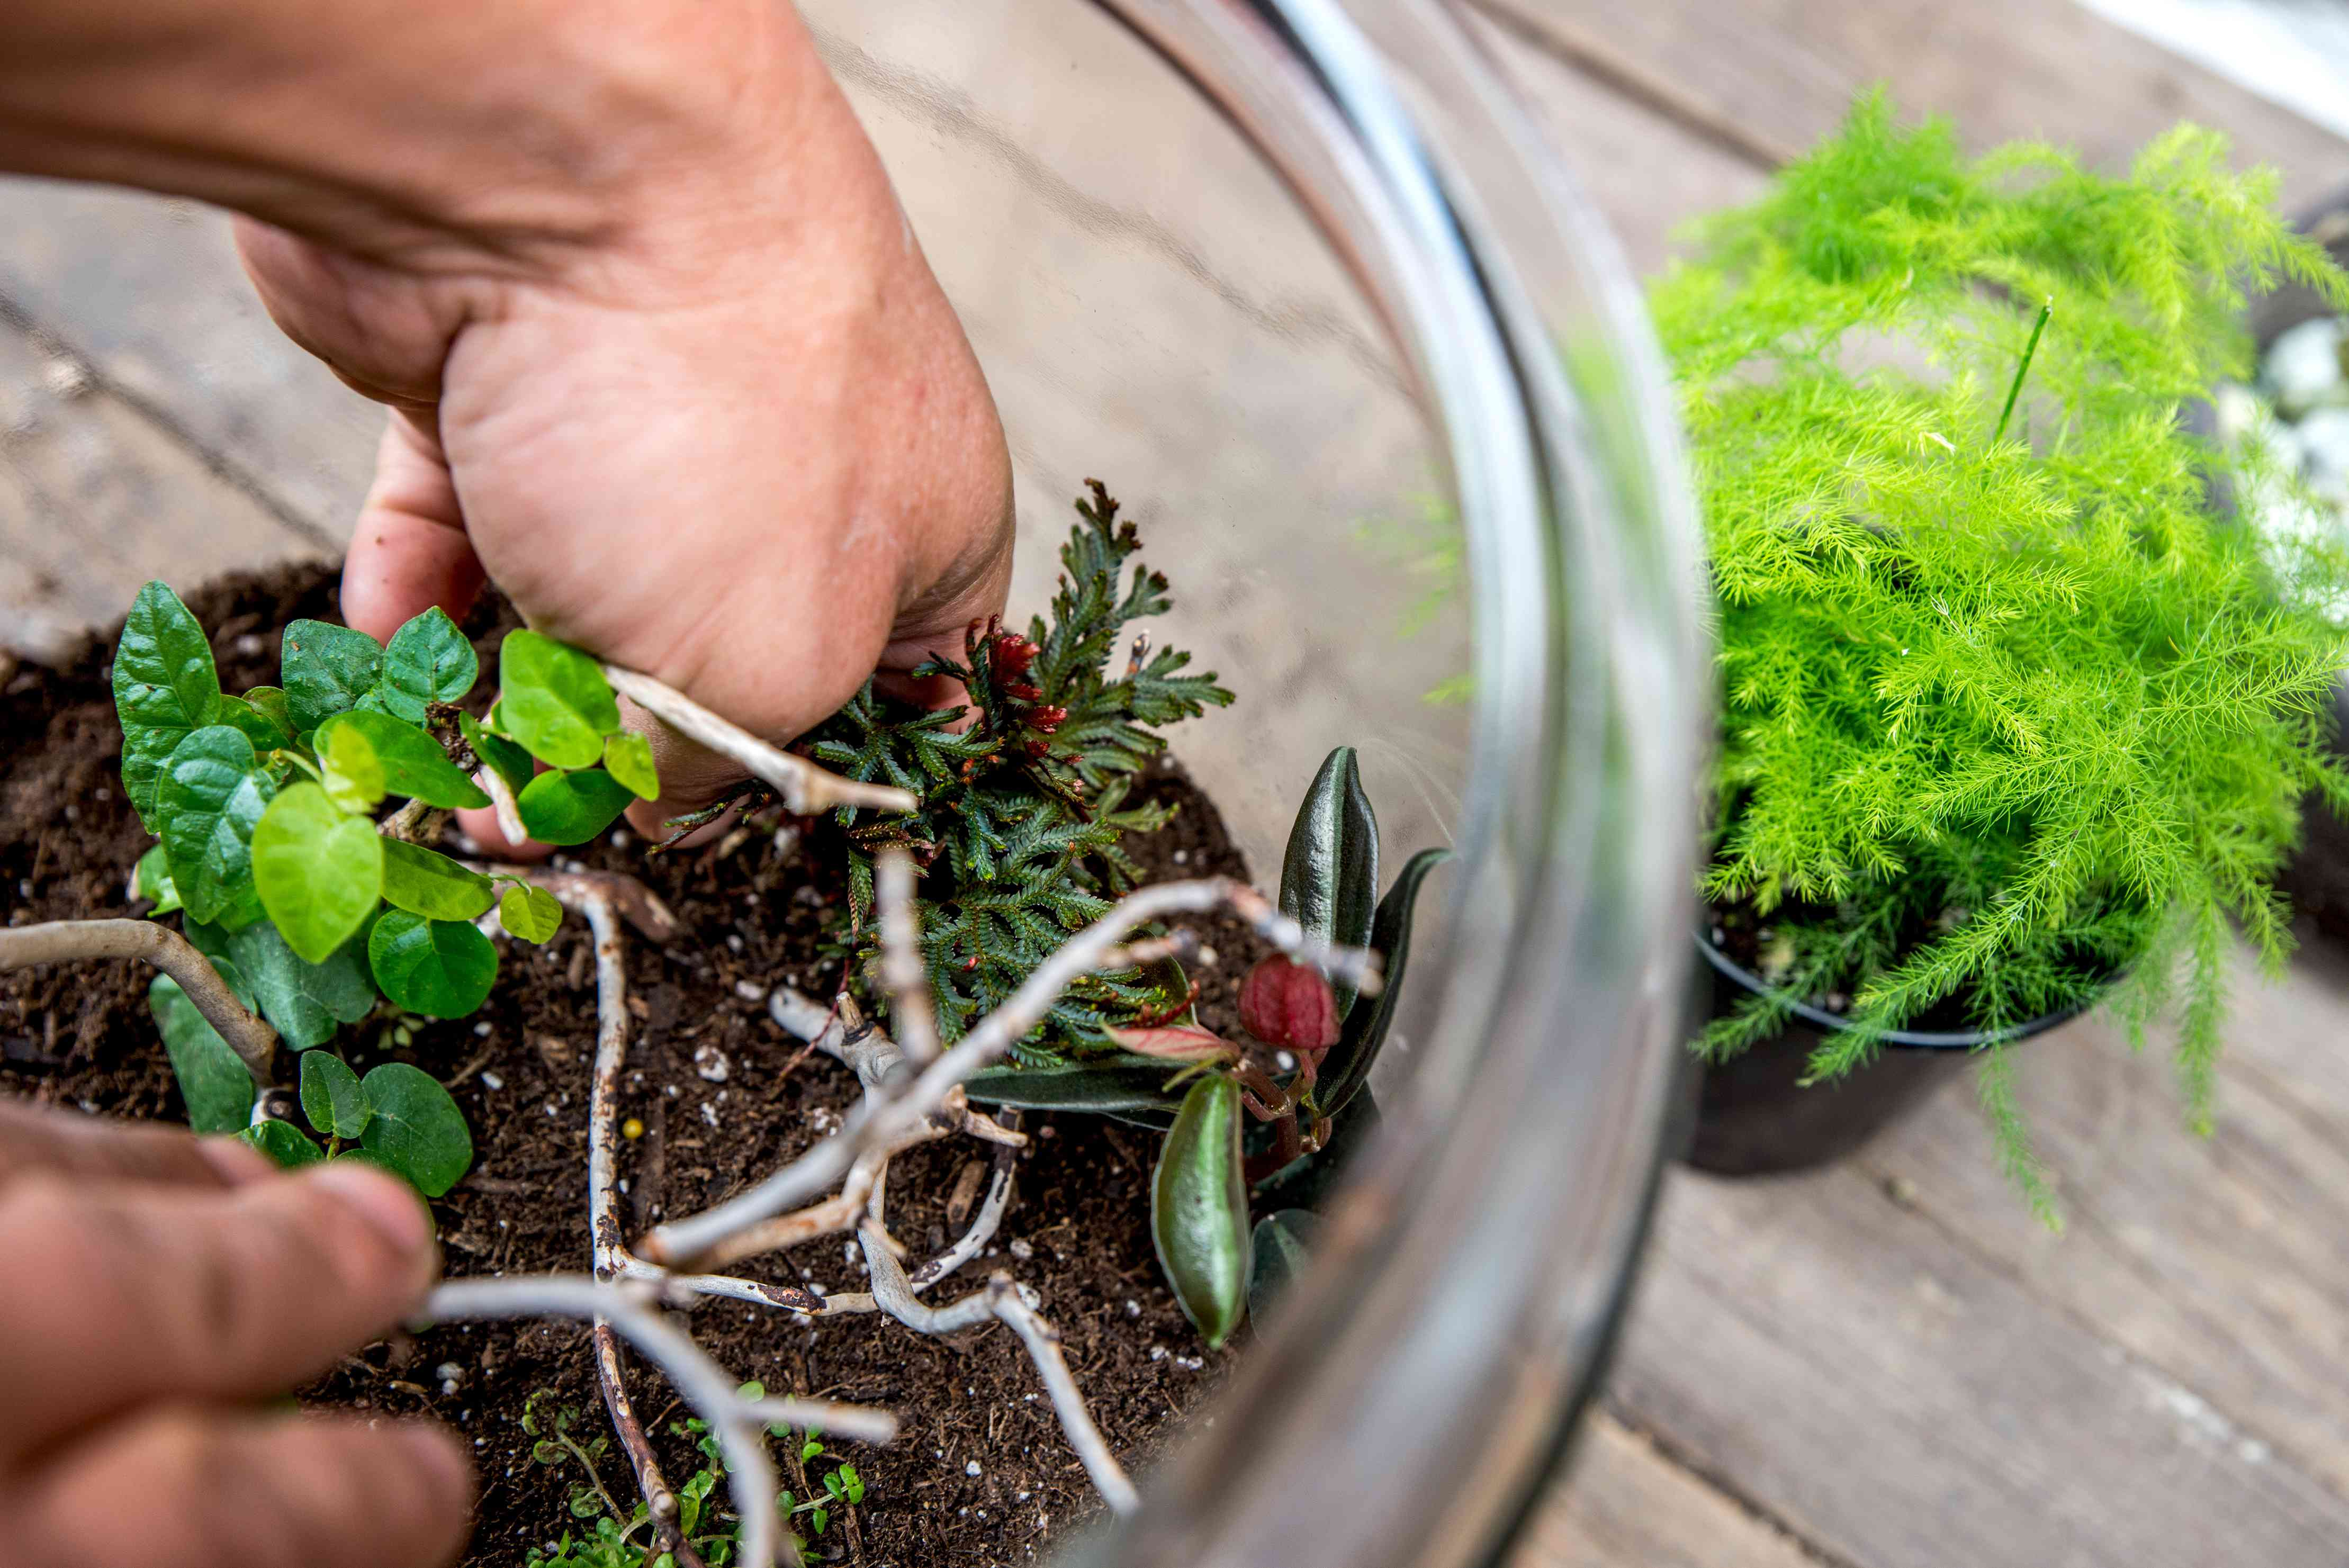 adding plants to the terrarium